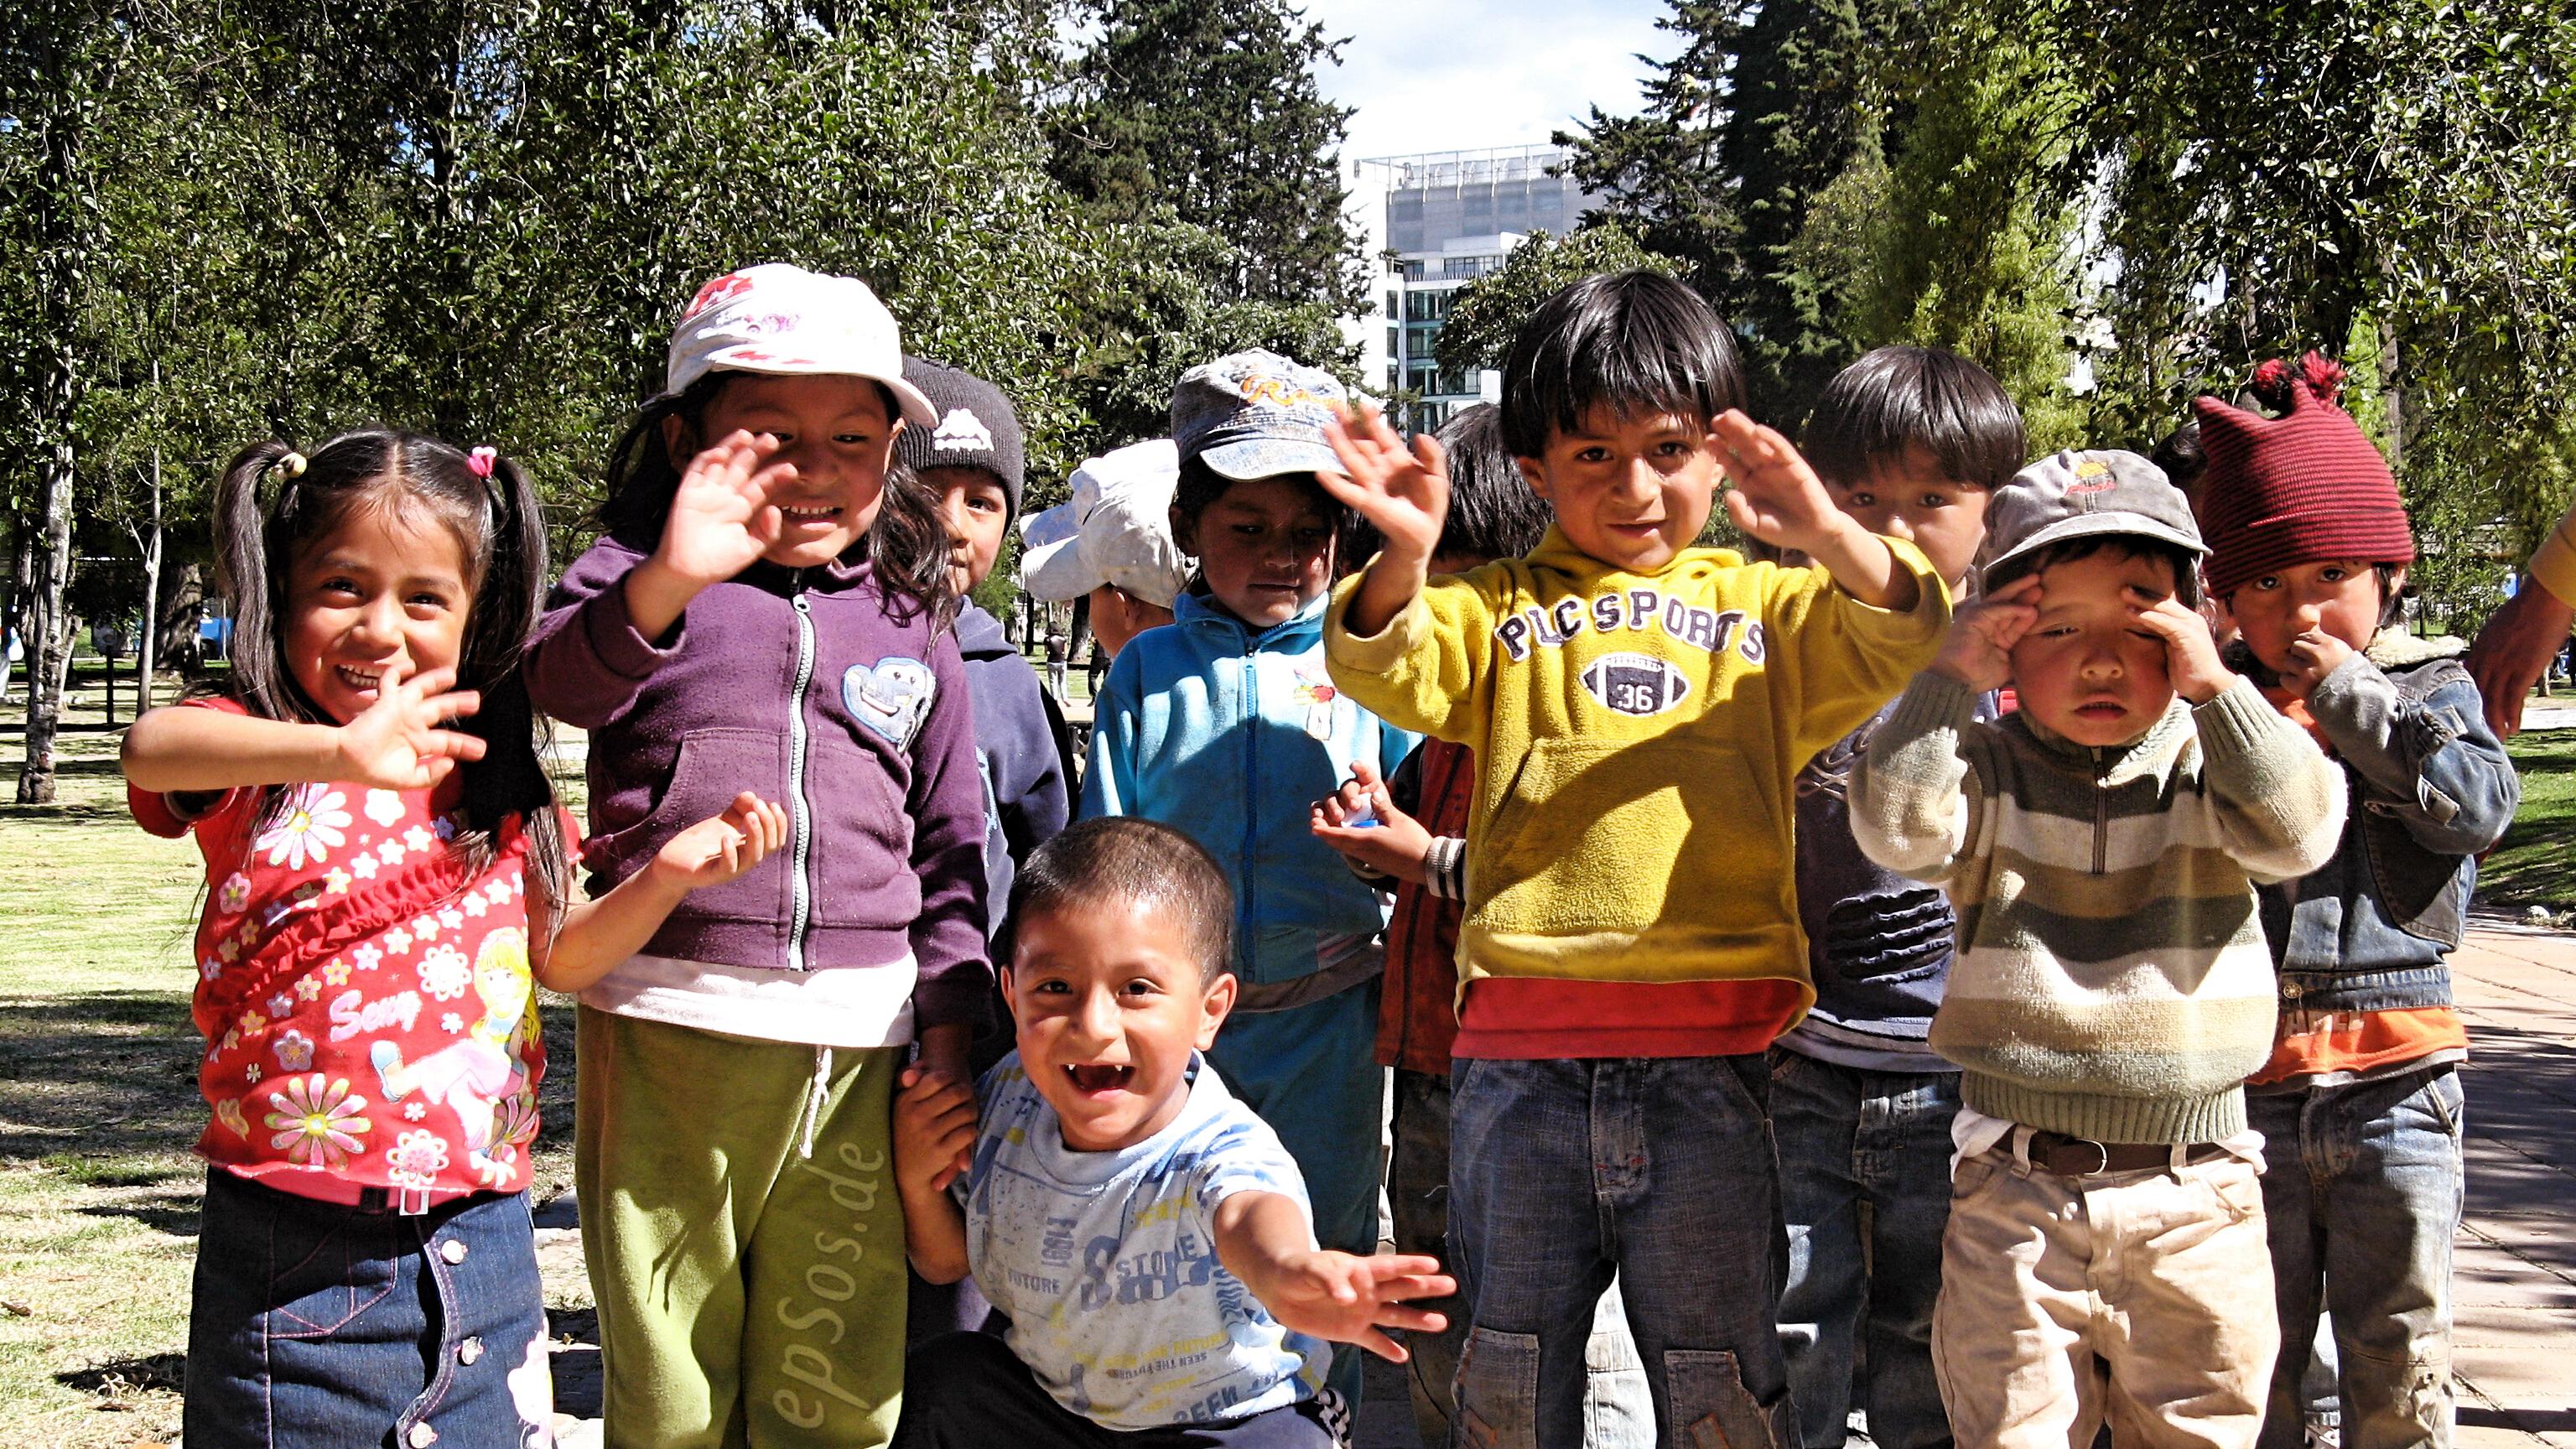 File:Happy Children Playing Kids.jpg - Wikimedia Commons